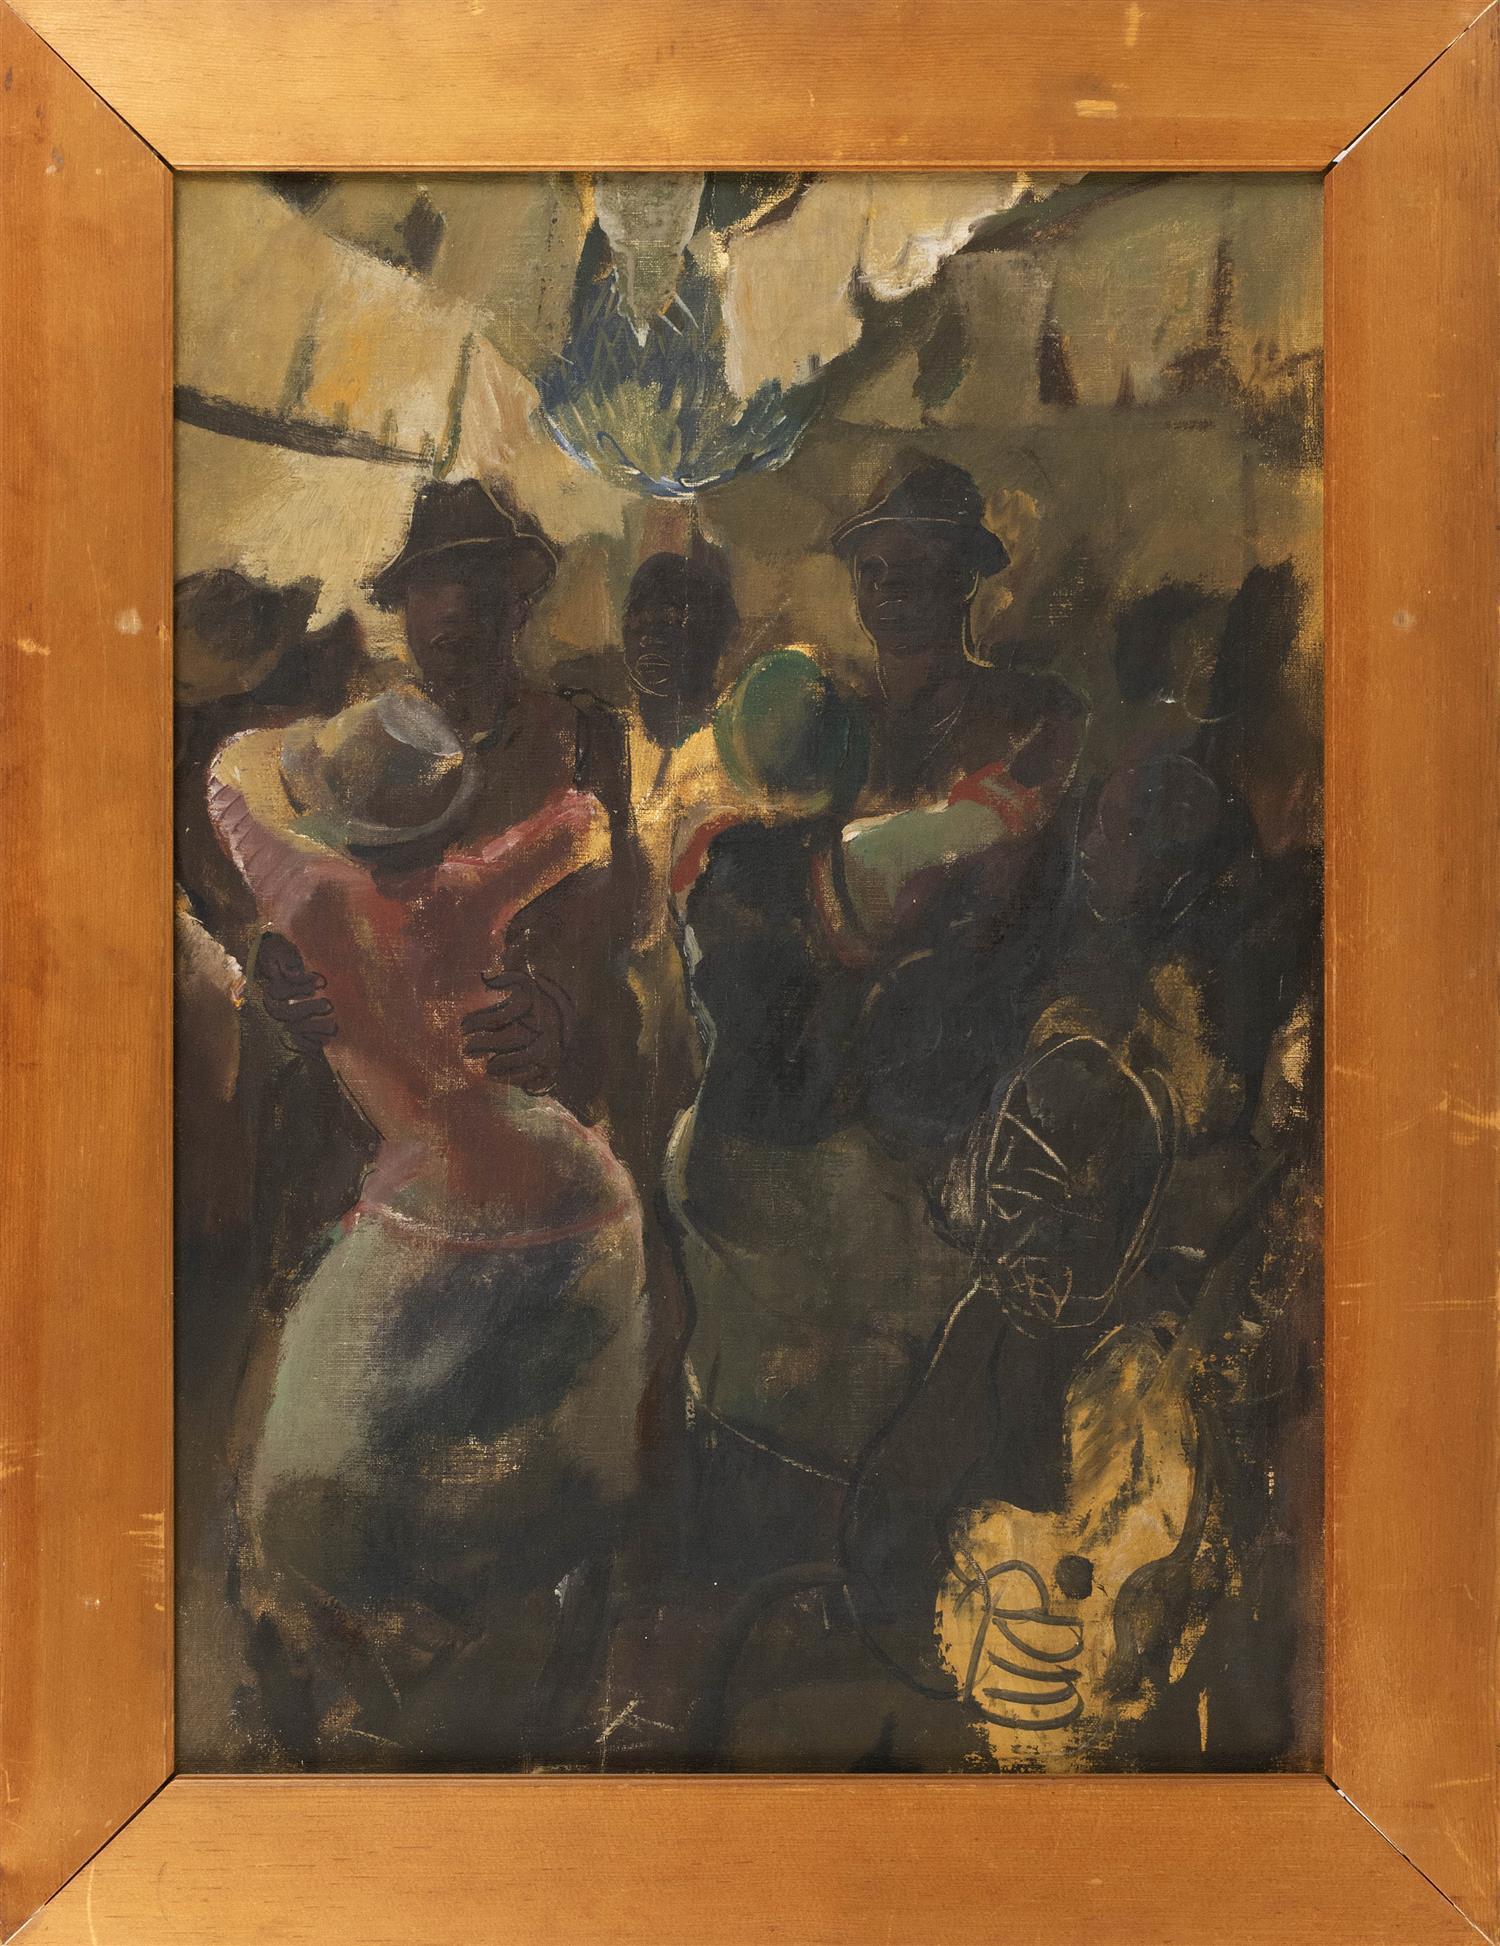 "ALEXANDRE YEVGENIEVICH YAKOVLEV, Russian Federation, 1887-1939, The Dance Hall., Oil on canvas, 26"" x 20"". Framed 32"" x 24""."